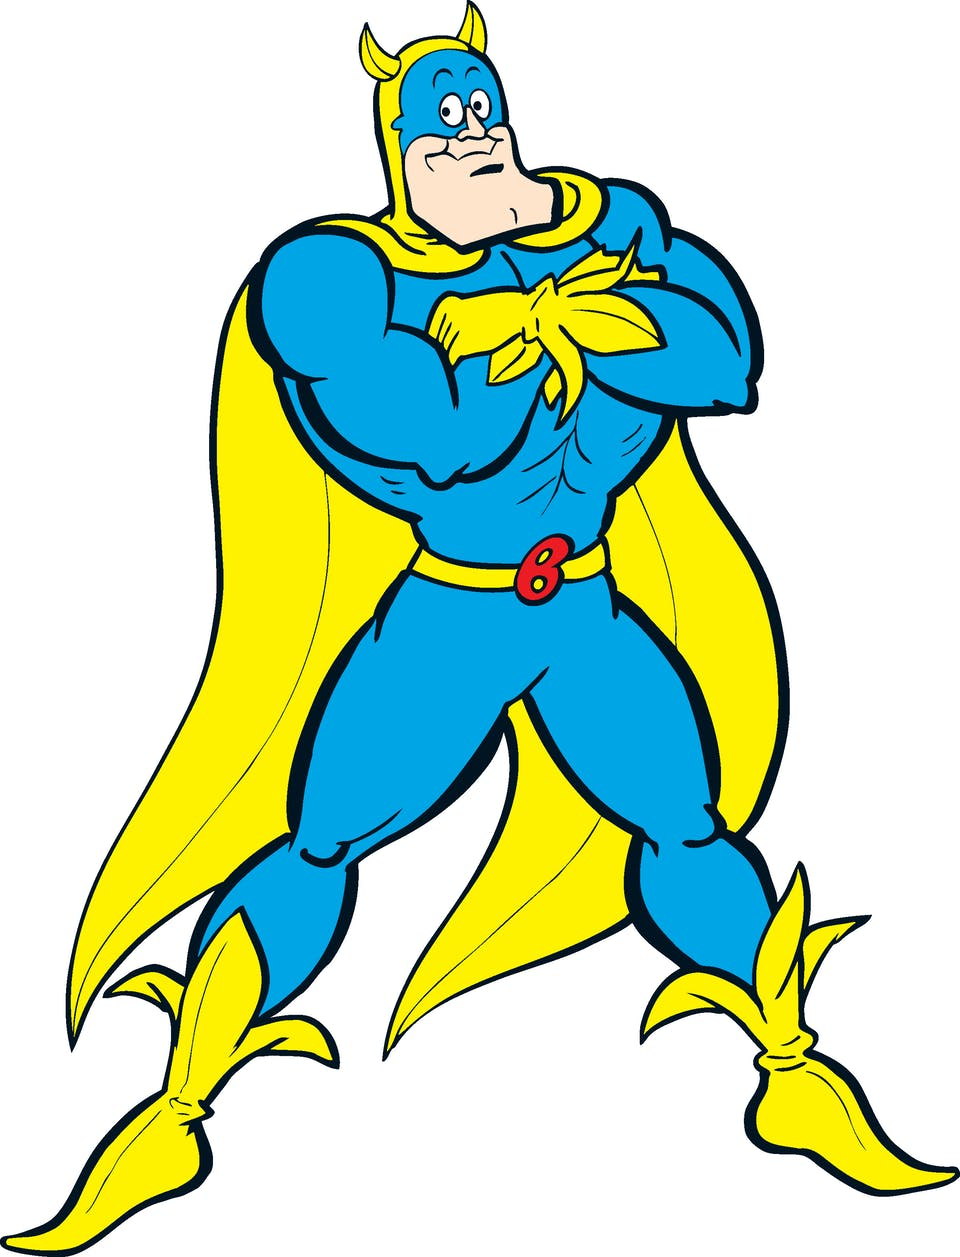 Bananaman standing